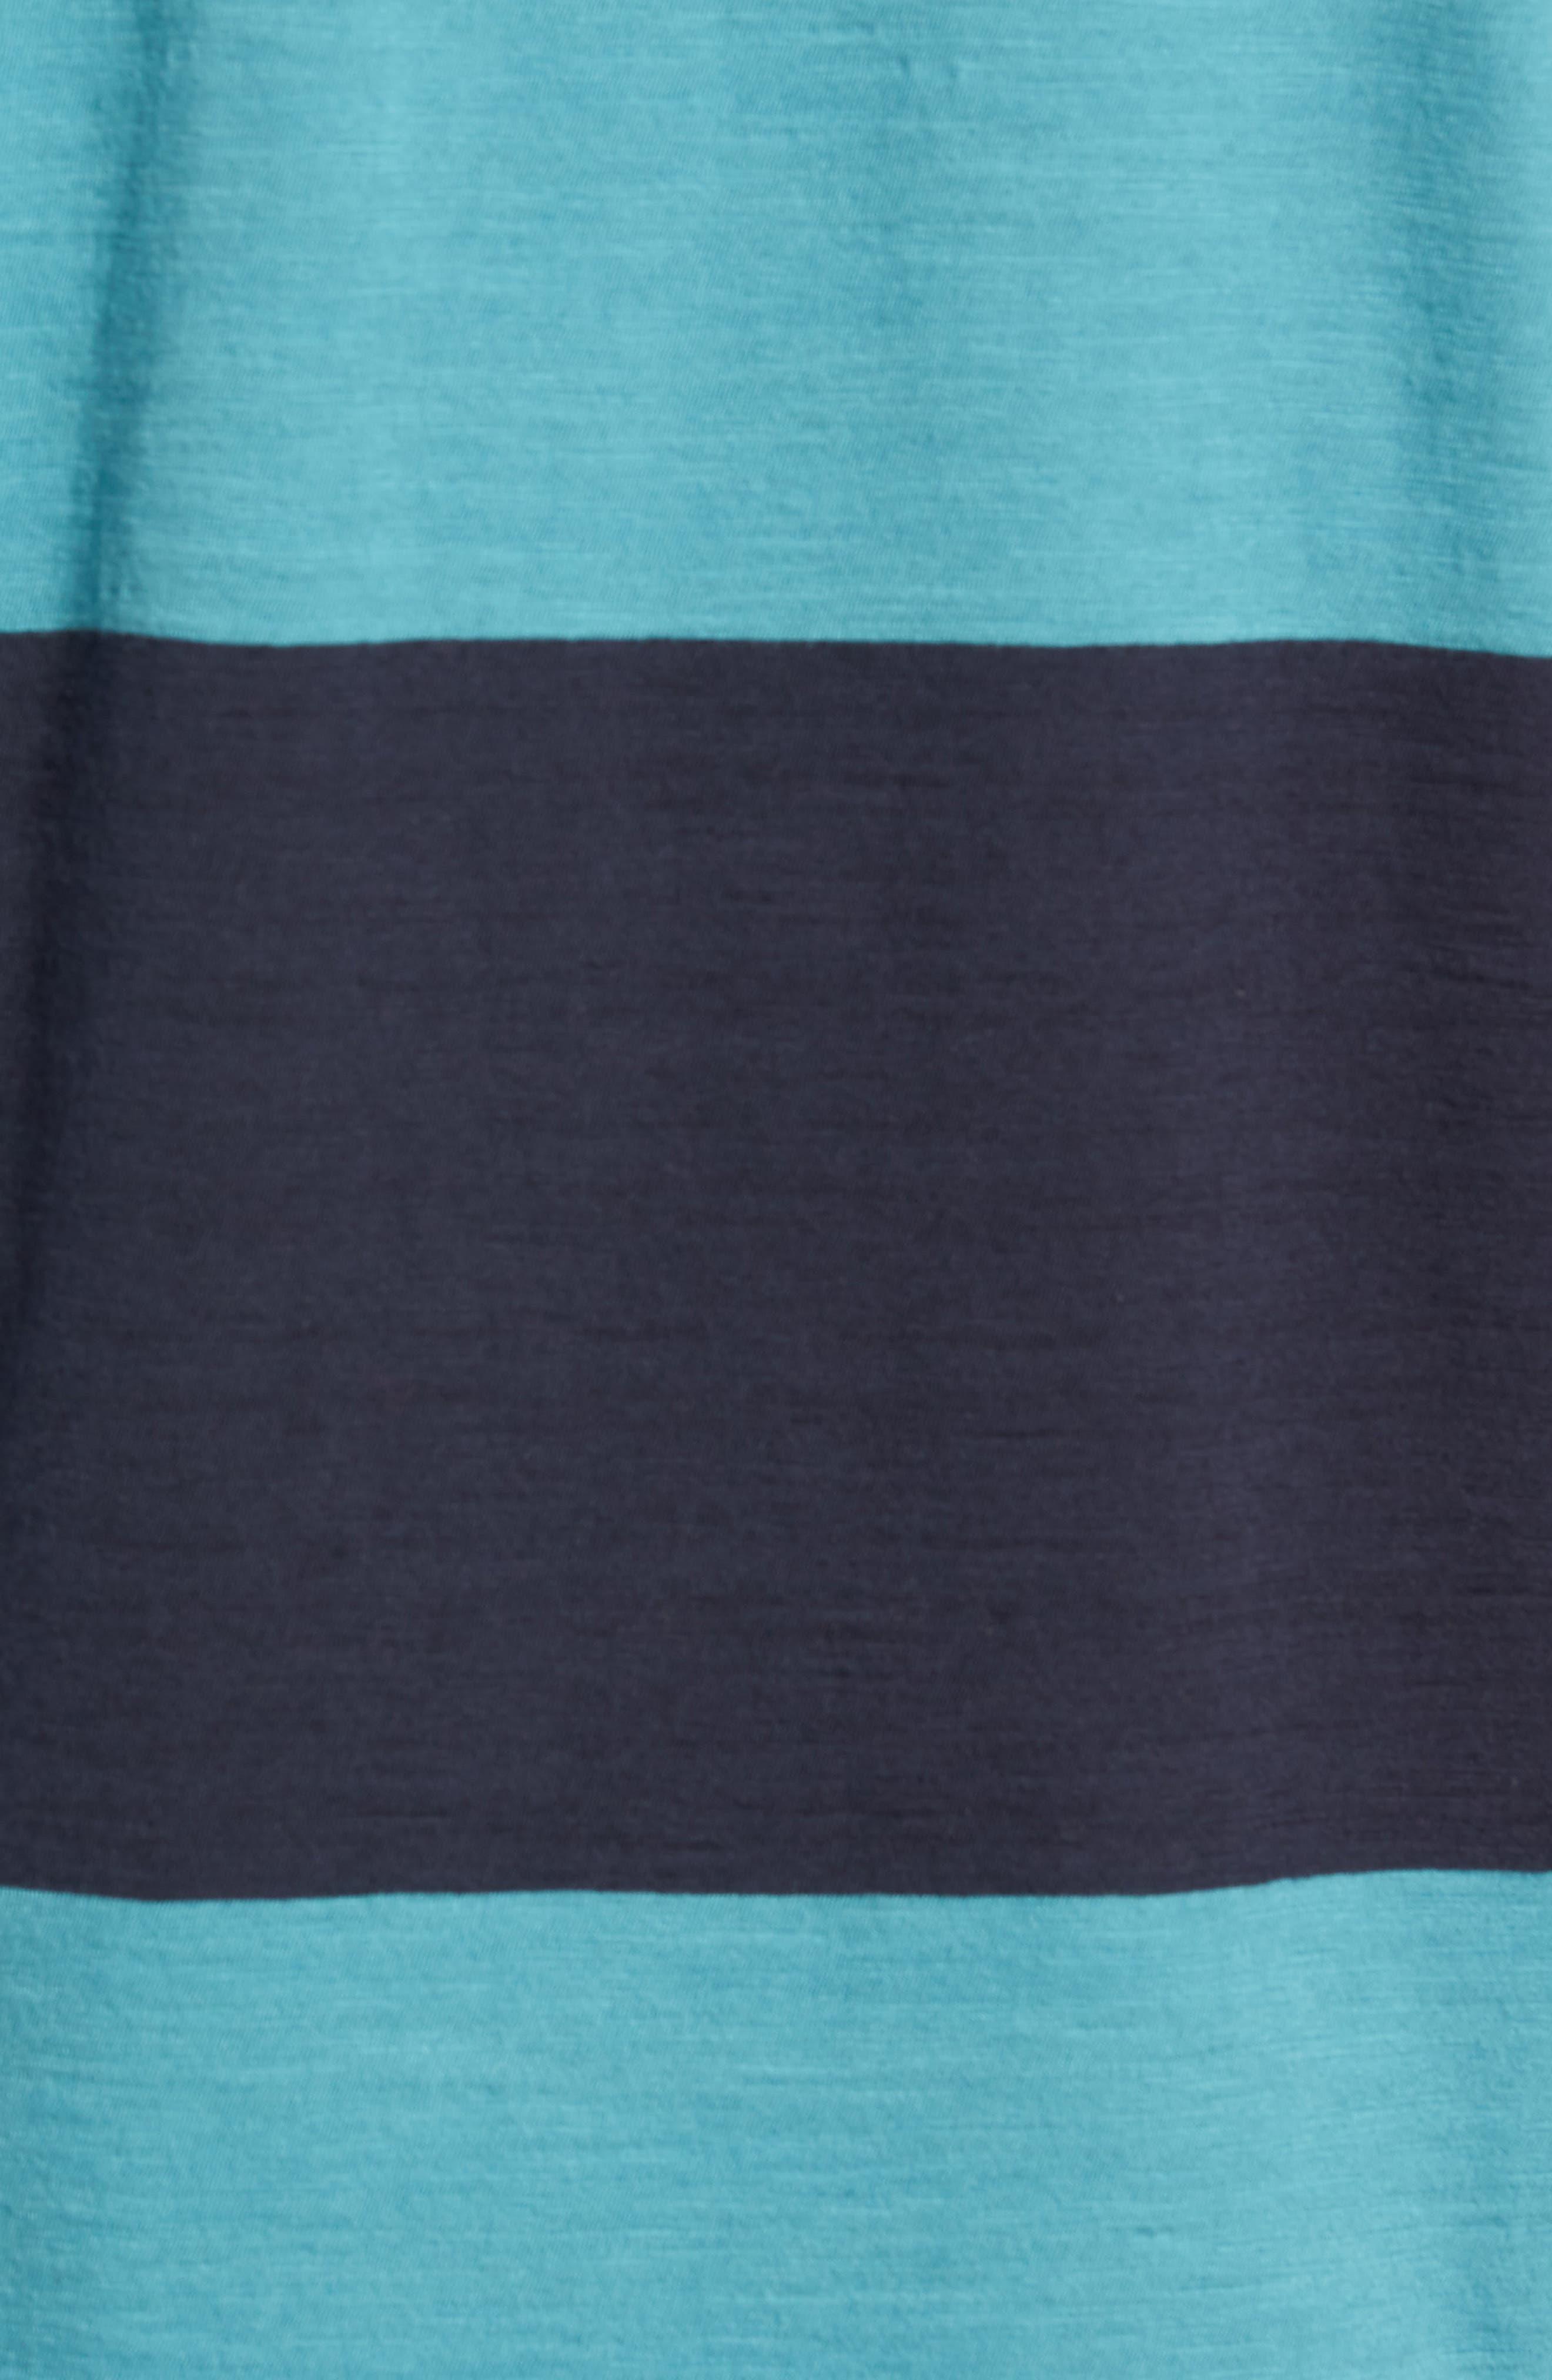 Colorblock Slubbed Pocket T-Shirt,                             Alternate thumbnail 5, color,                             NAVY/ BLUE